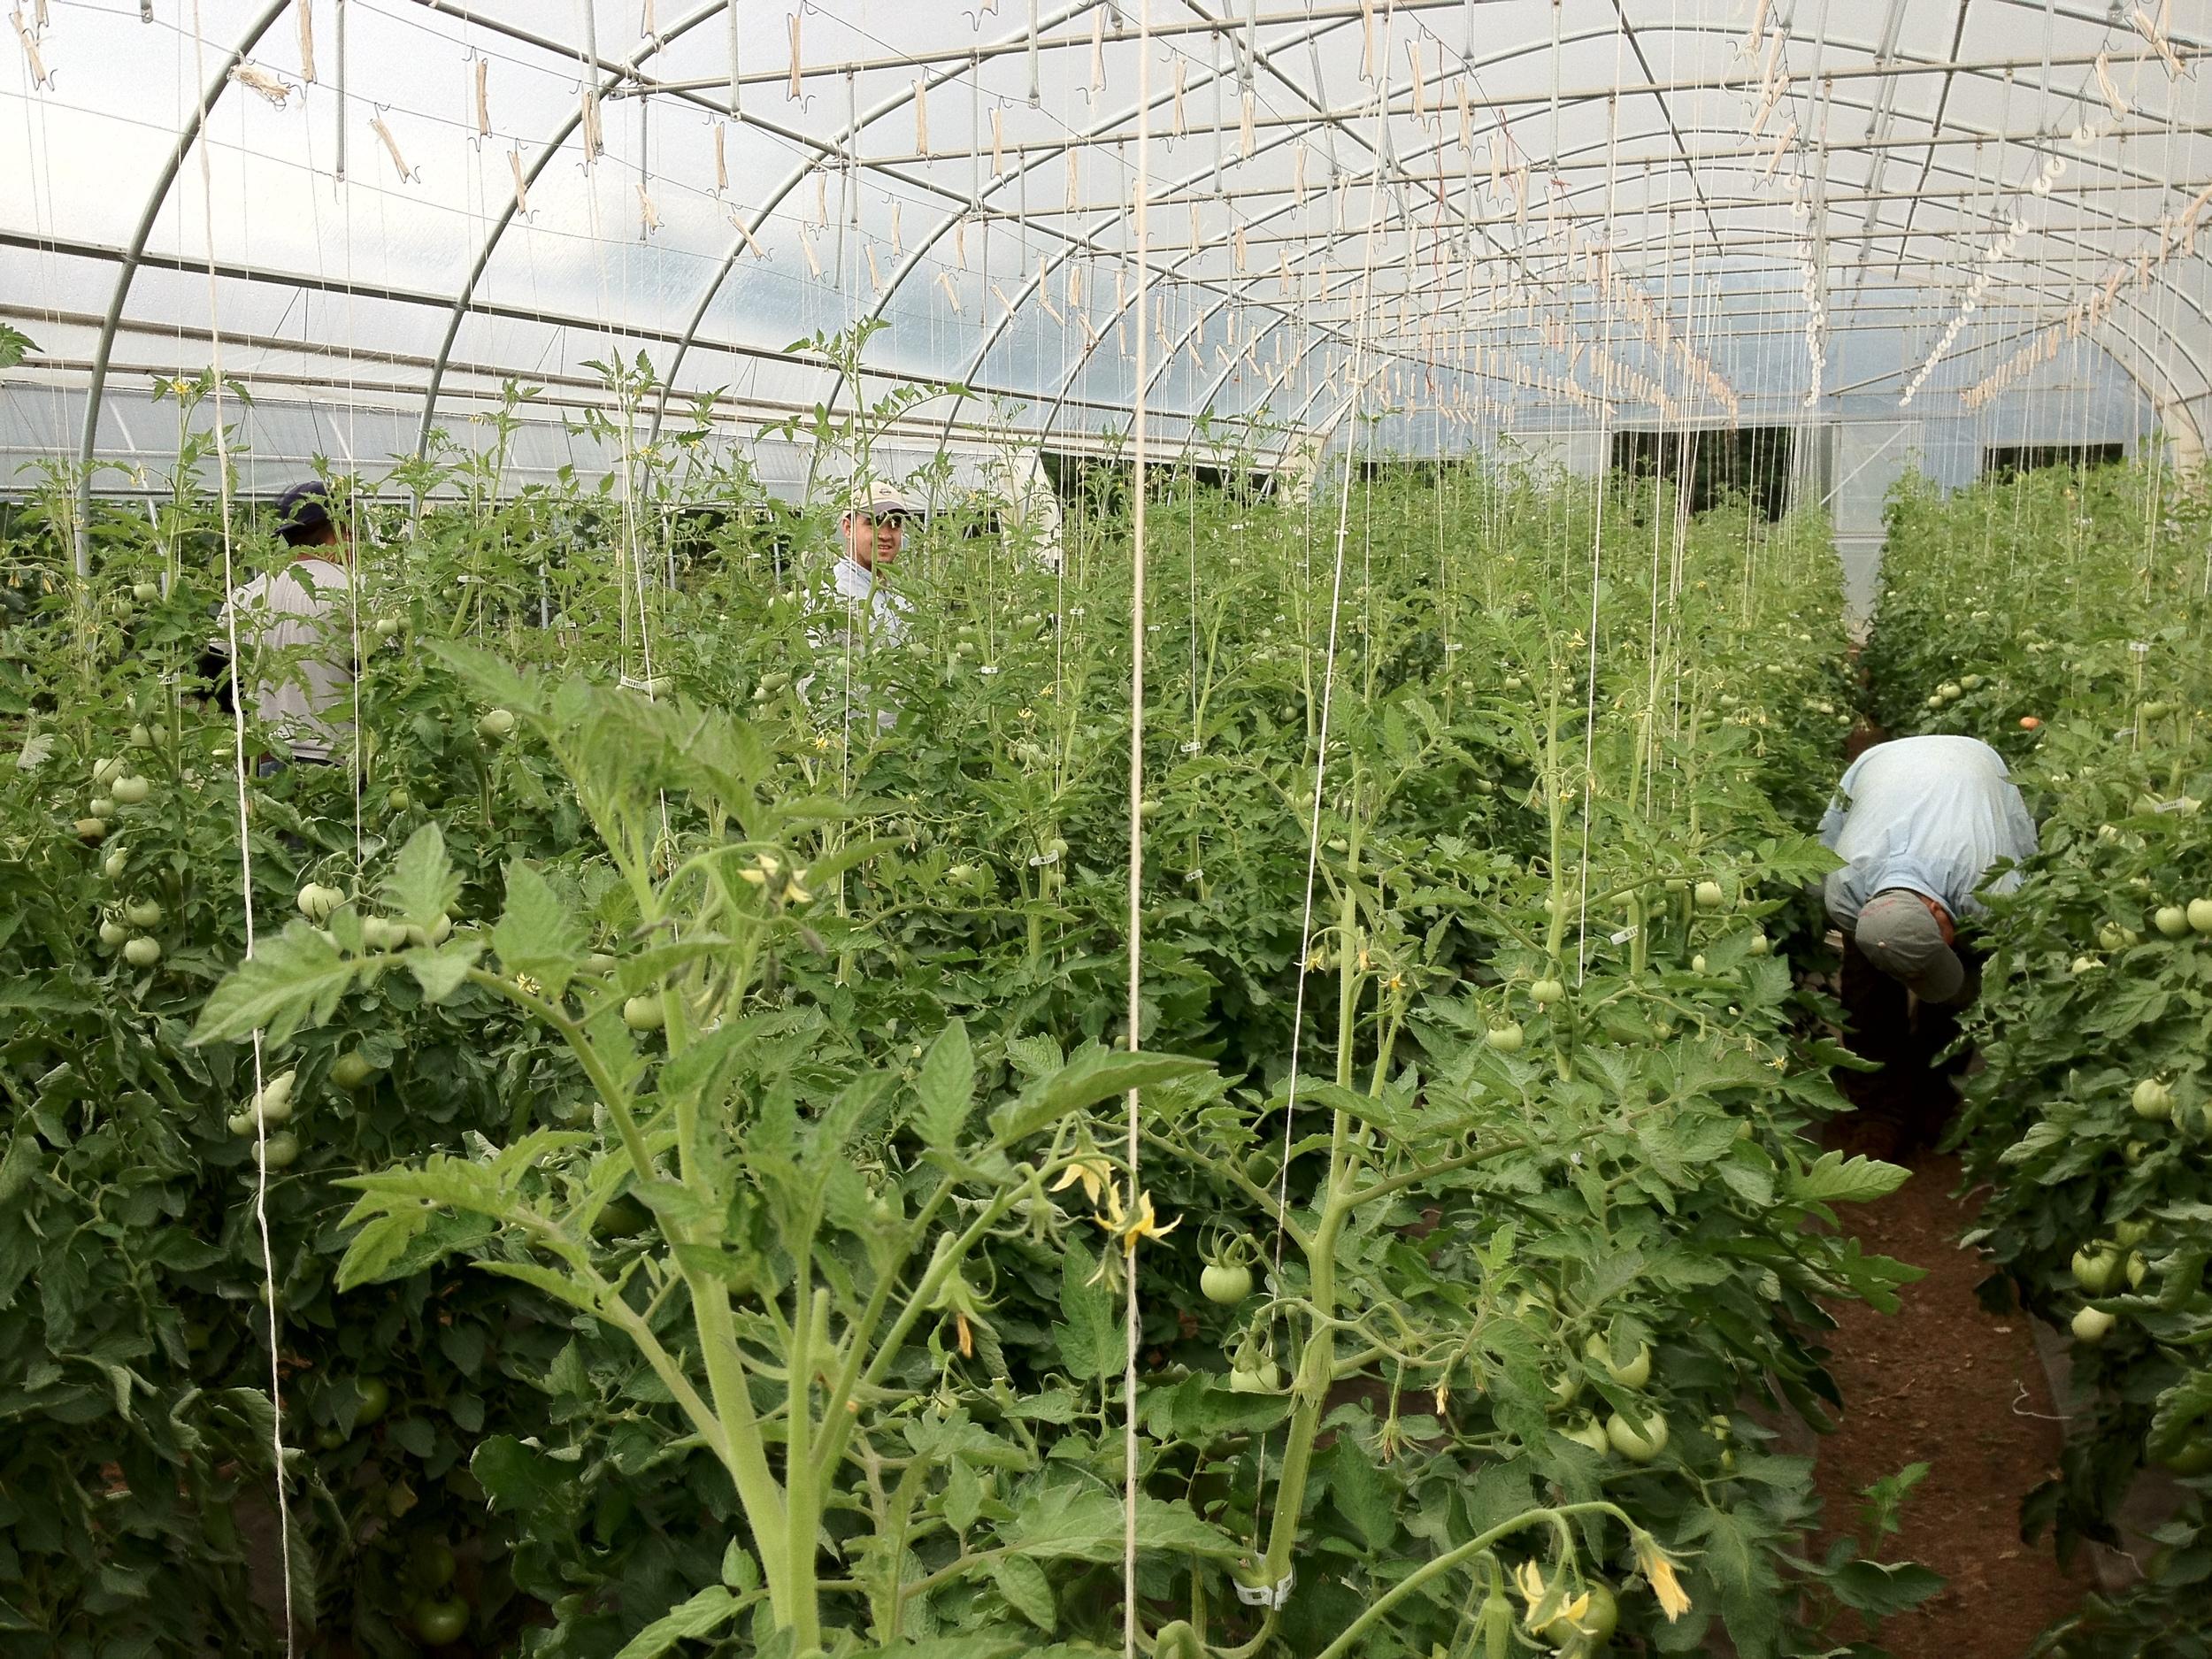 Crew Harvesting June 2012